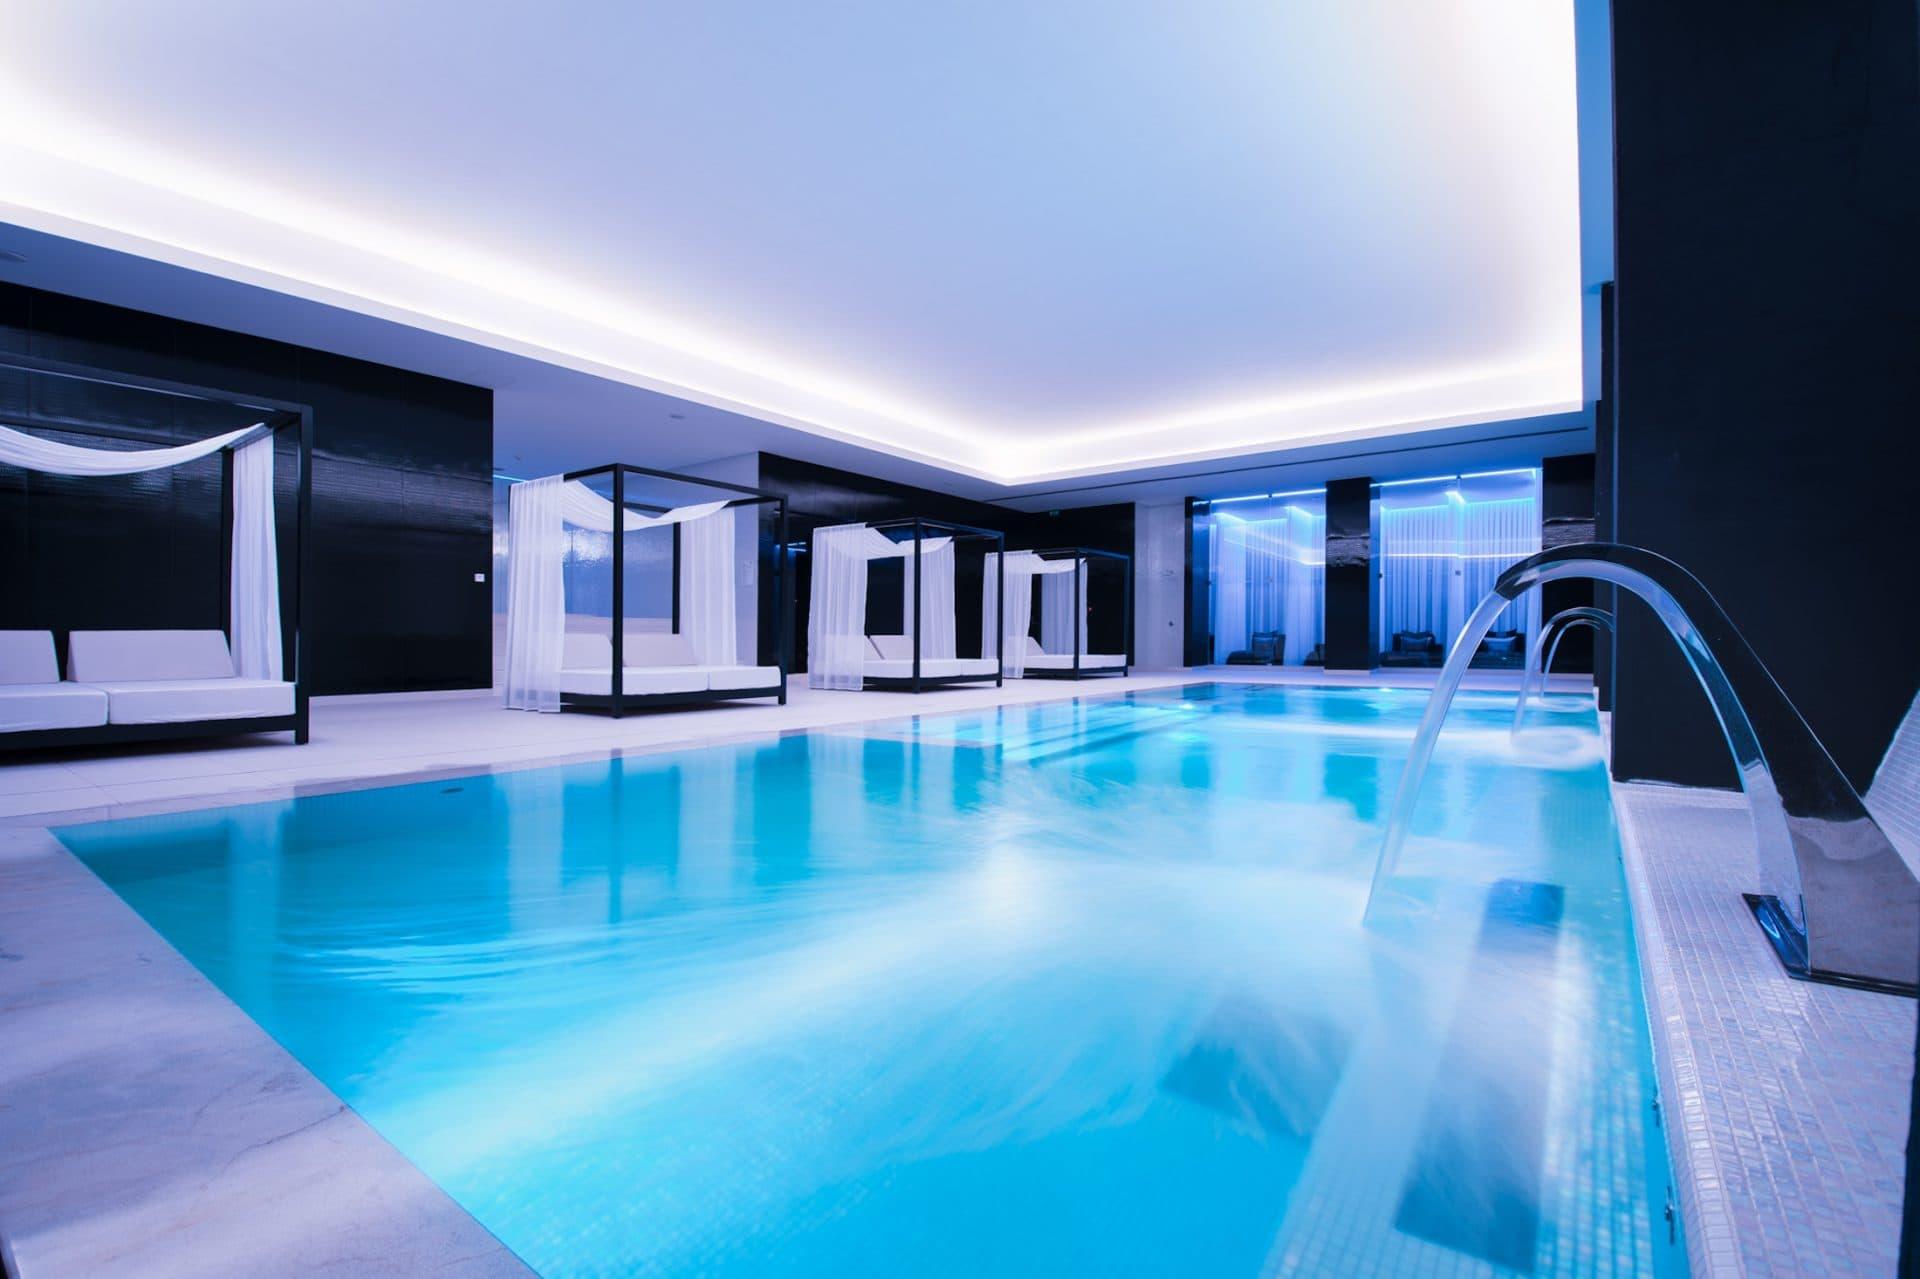 osmos-wellness-center-vidamar-hotels-resorts-algarve-1